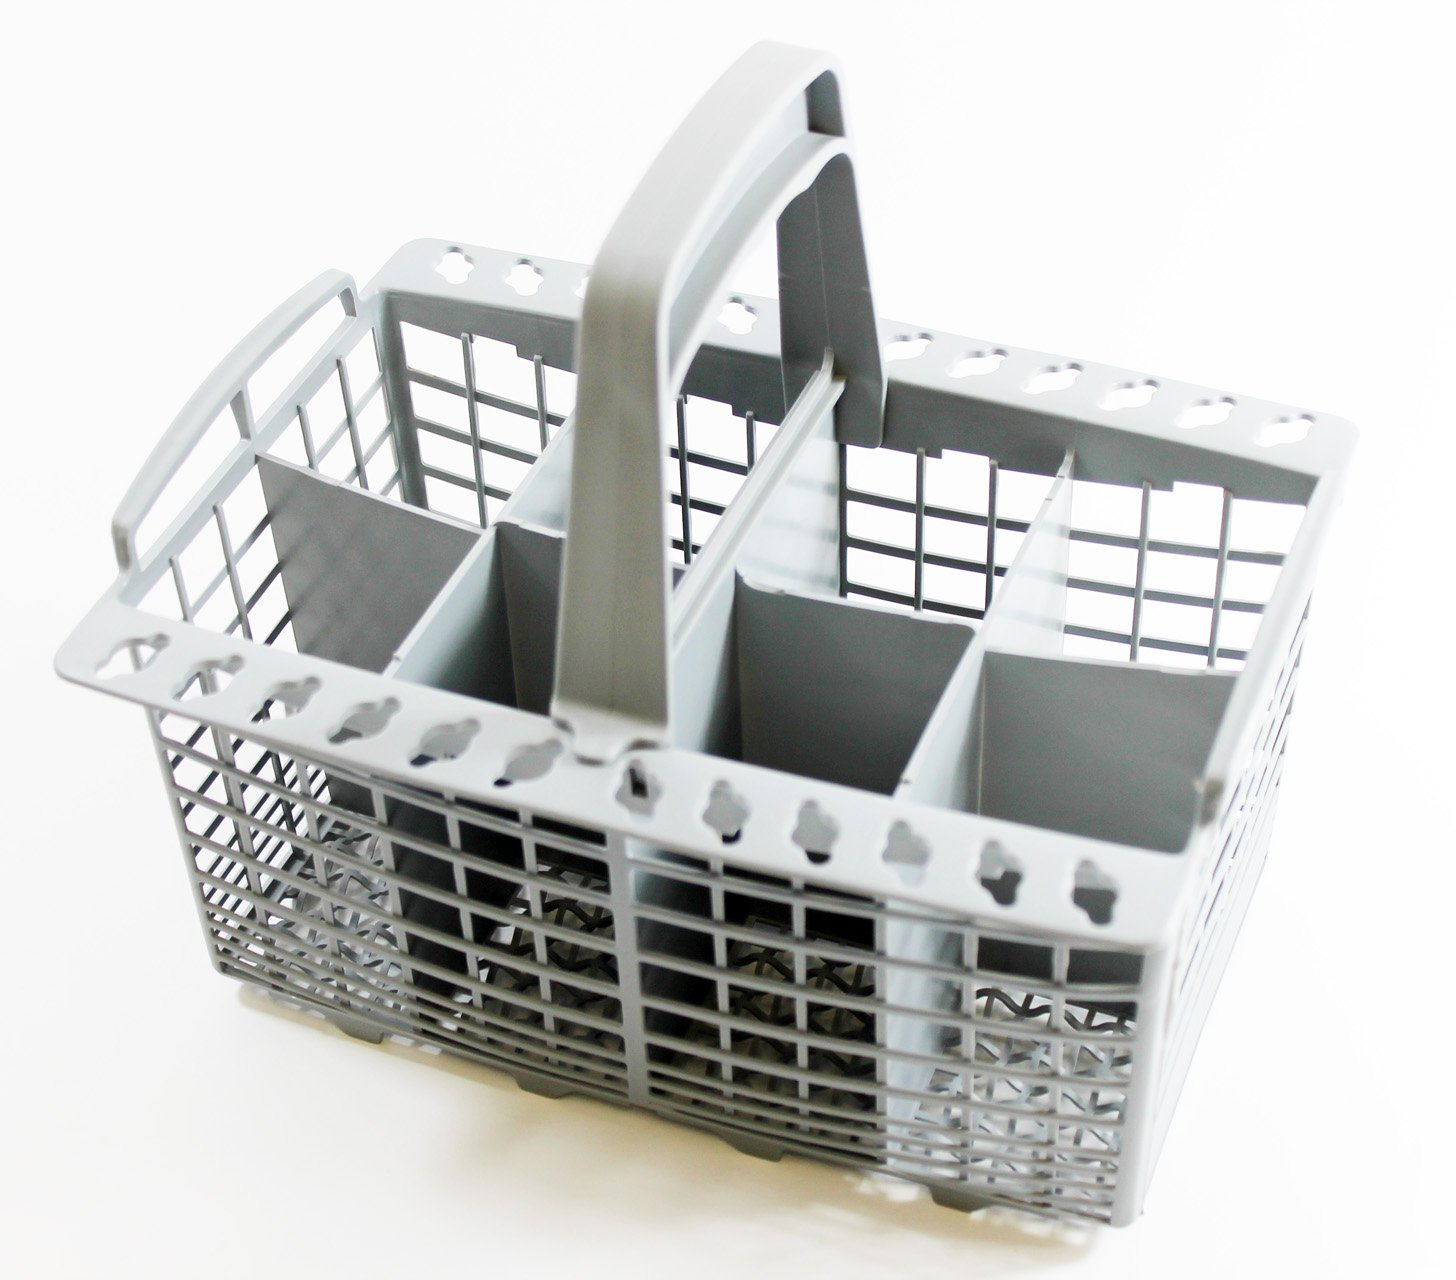 Universal Dishwasher Cutlery Basket By SPAREGETTI® To fit Bosch- Hotpoint- Whirlpool- Neff-Siemens-Smeg -Carrera -Eurotech- Homark- Lendi- Powerpoint- Servis- White Westinghouse- Baumatic-Tecnik- CDA- Siemens- Hoover-Dedietrich- Brandt- Gorenje- Indesit- C